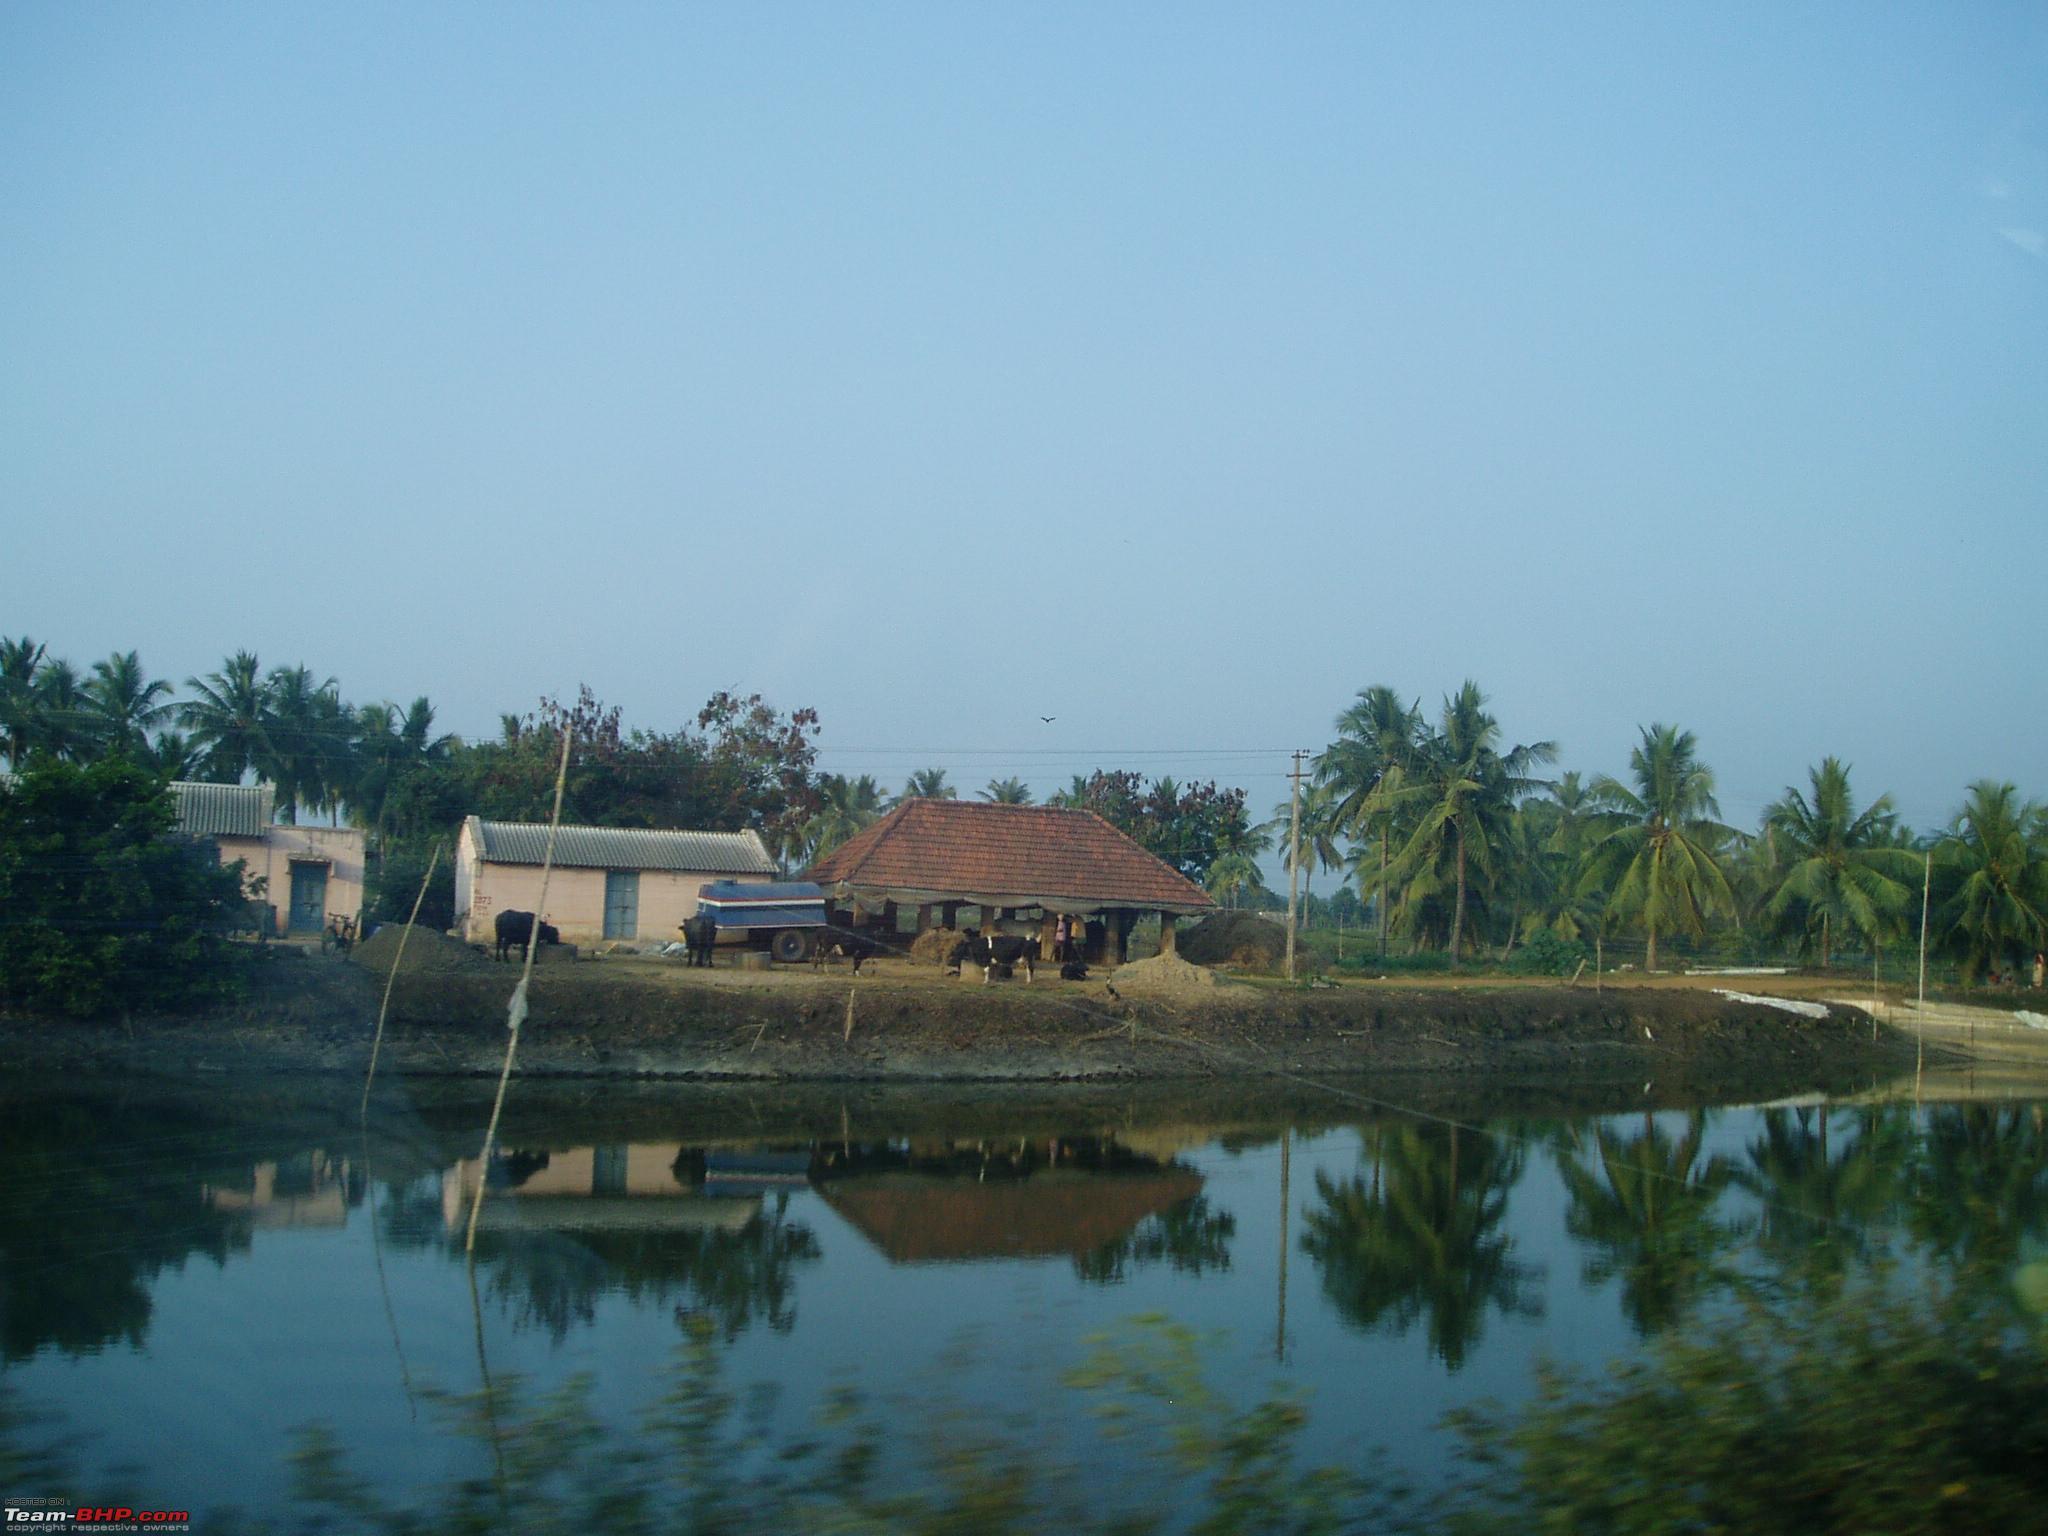 Coastal Andhra wwwteambhpcomforumattachmentstravelogues919